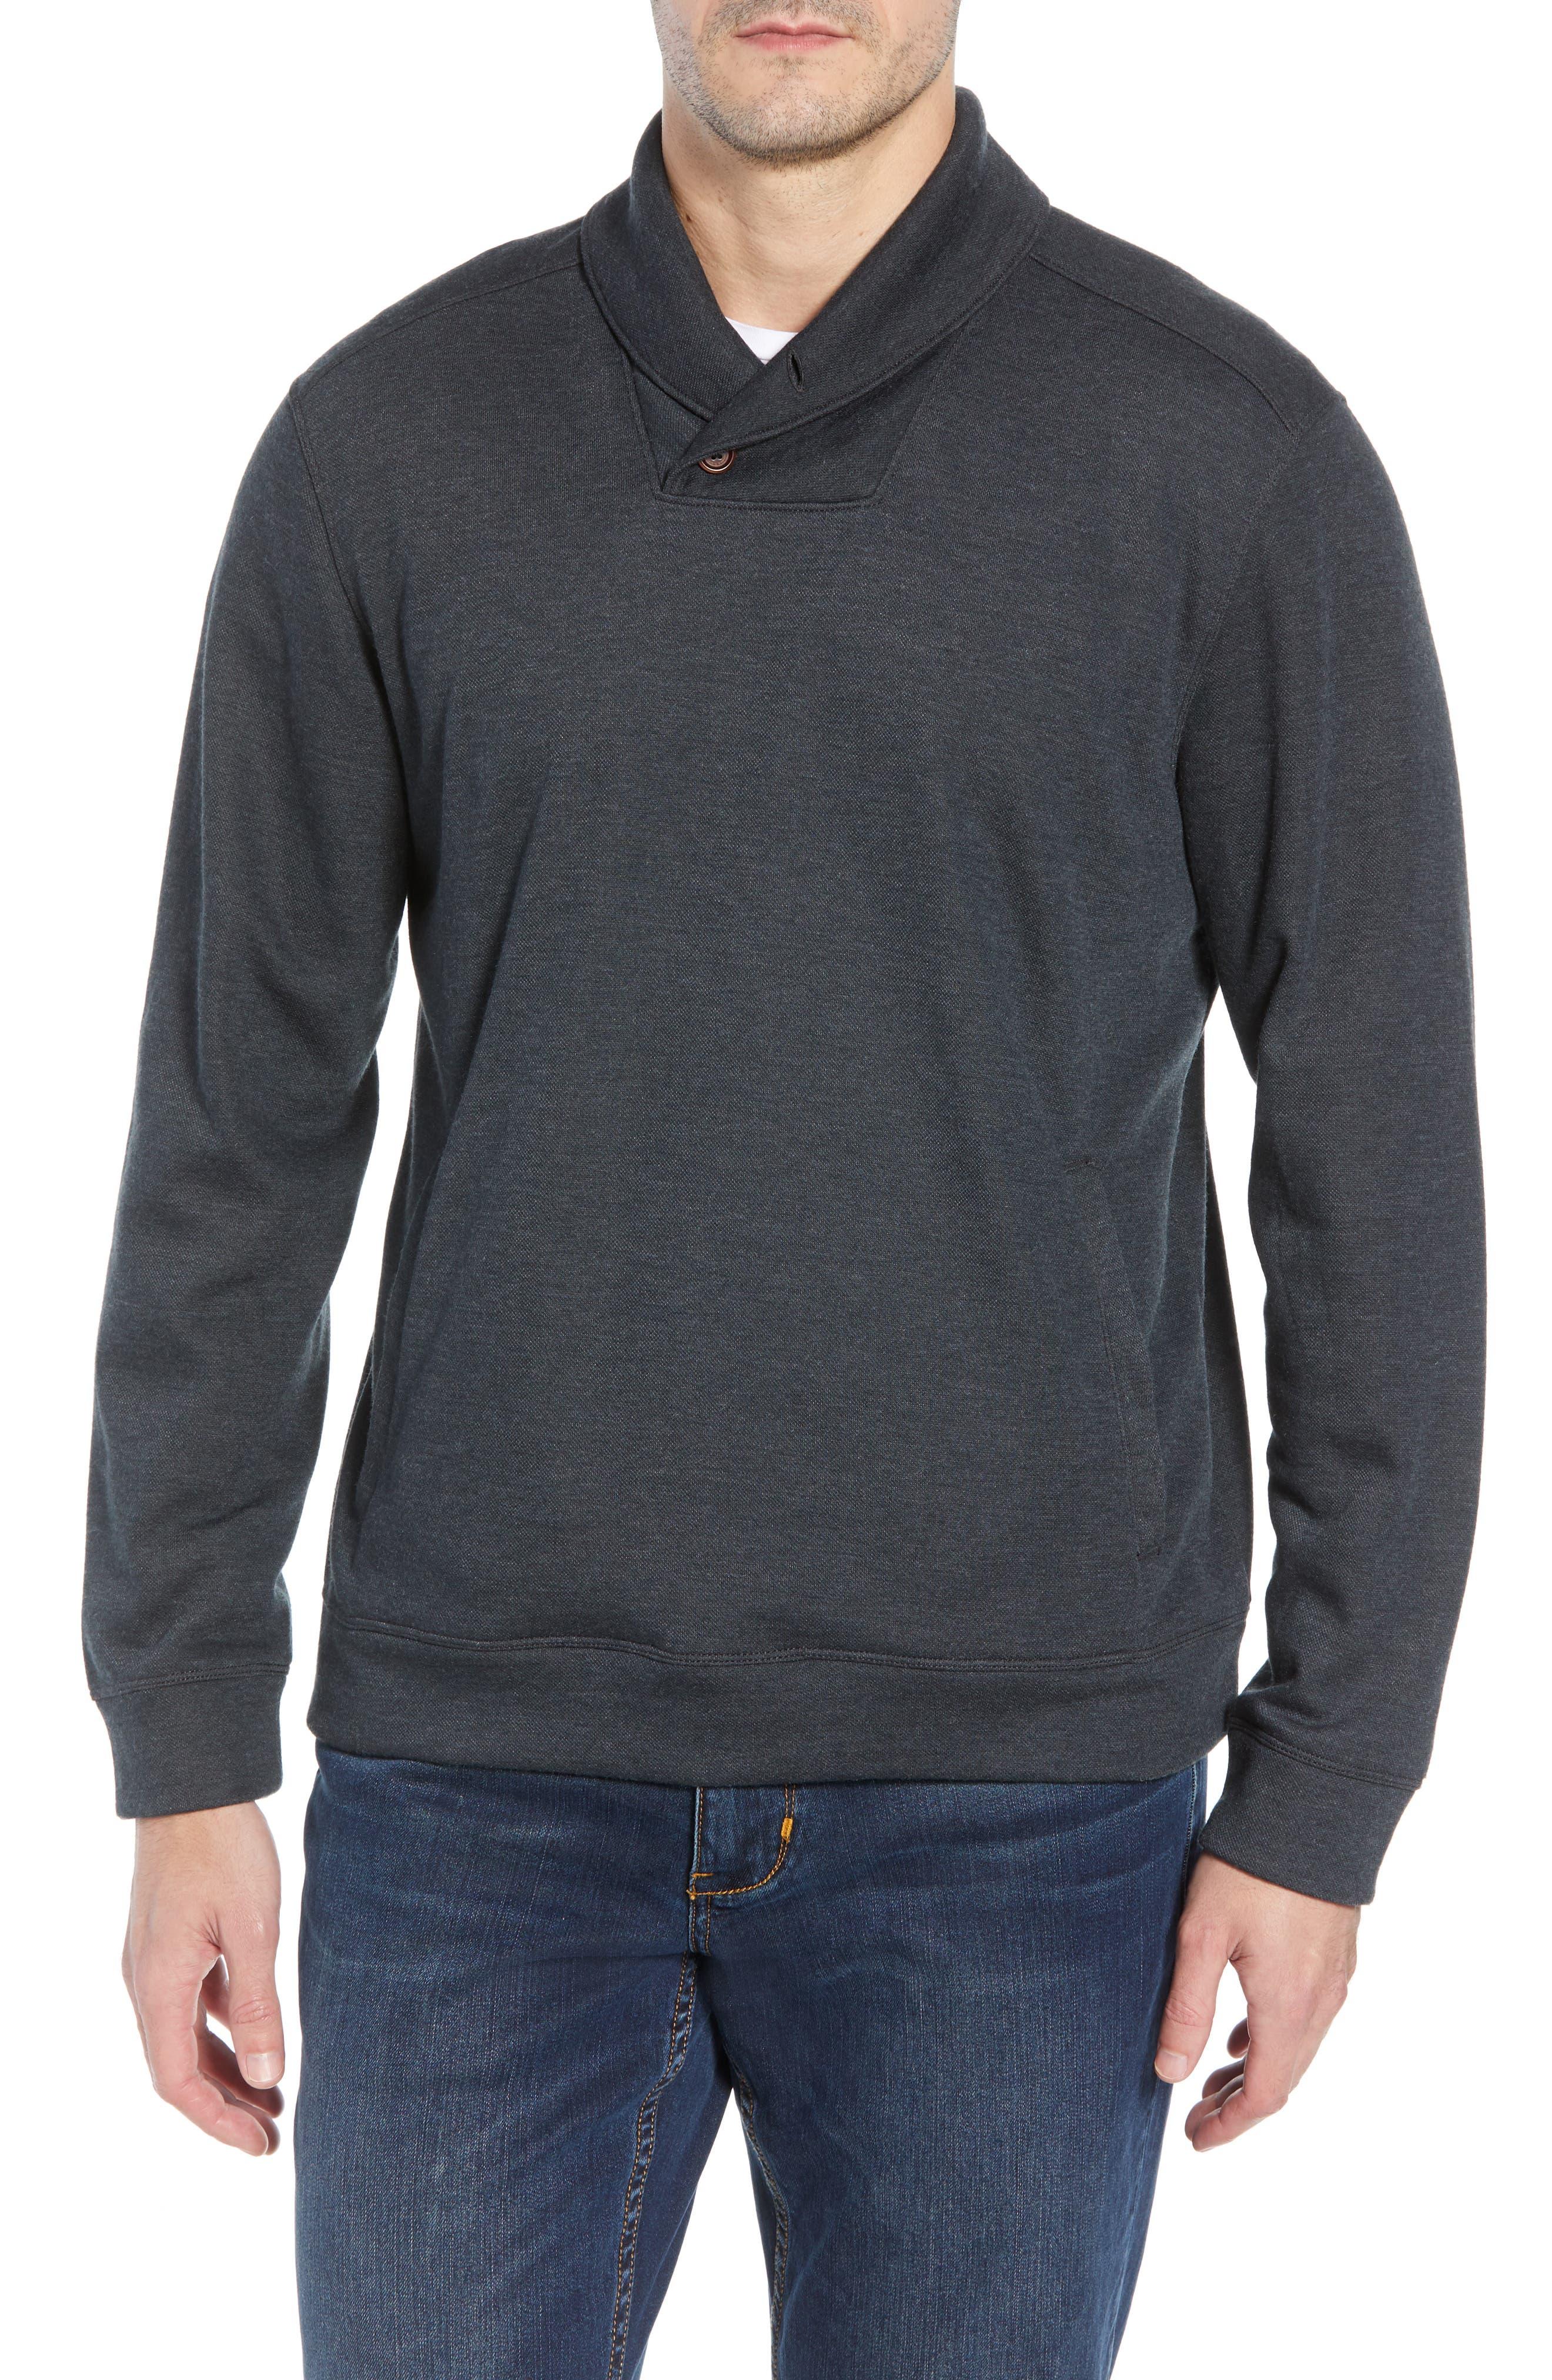 Sandbar Shawl Collar Regular Fit Pullover,                             Main thumbnail 1, color,                             COAL